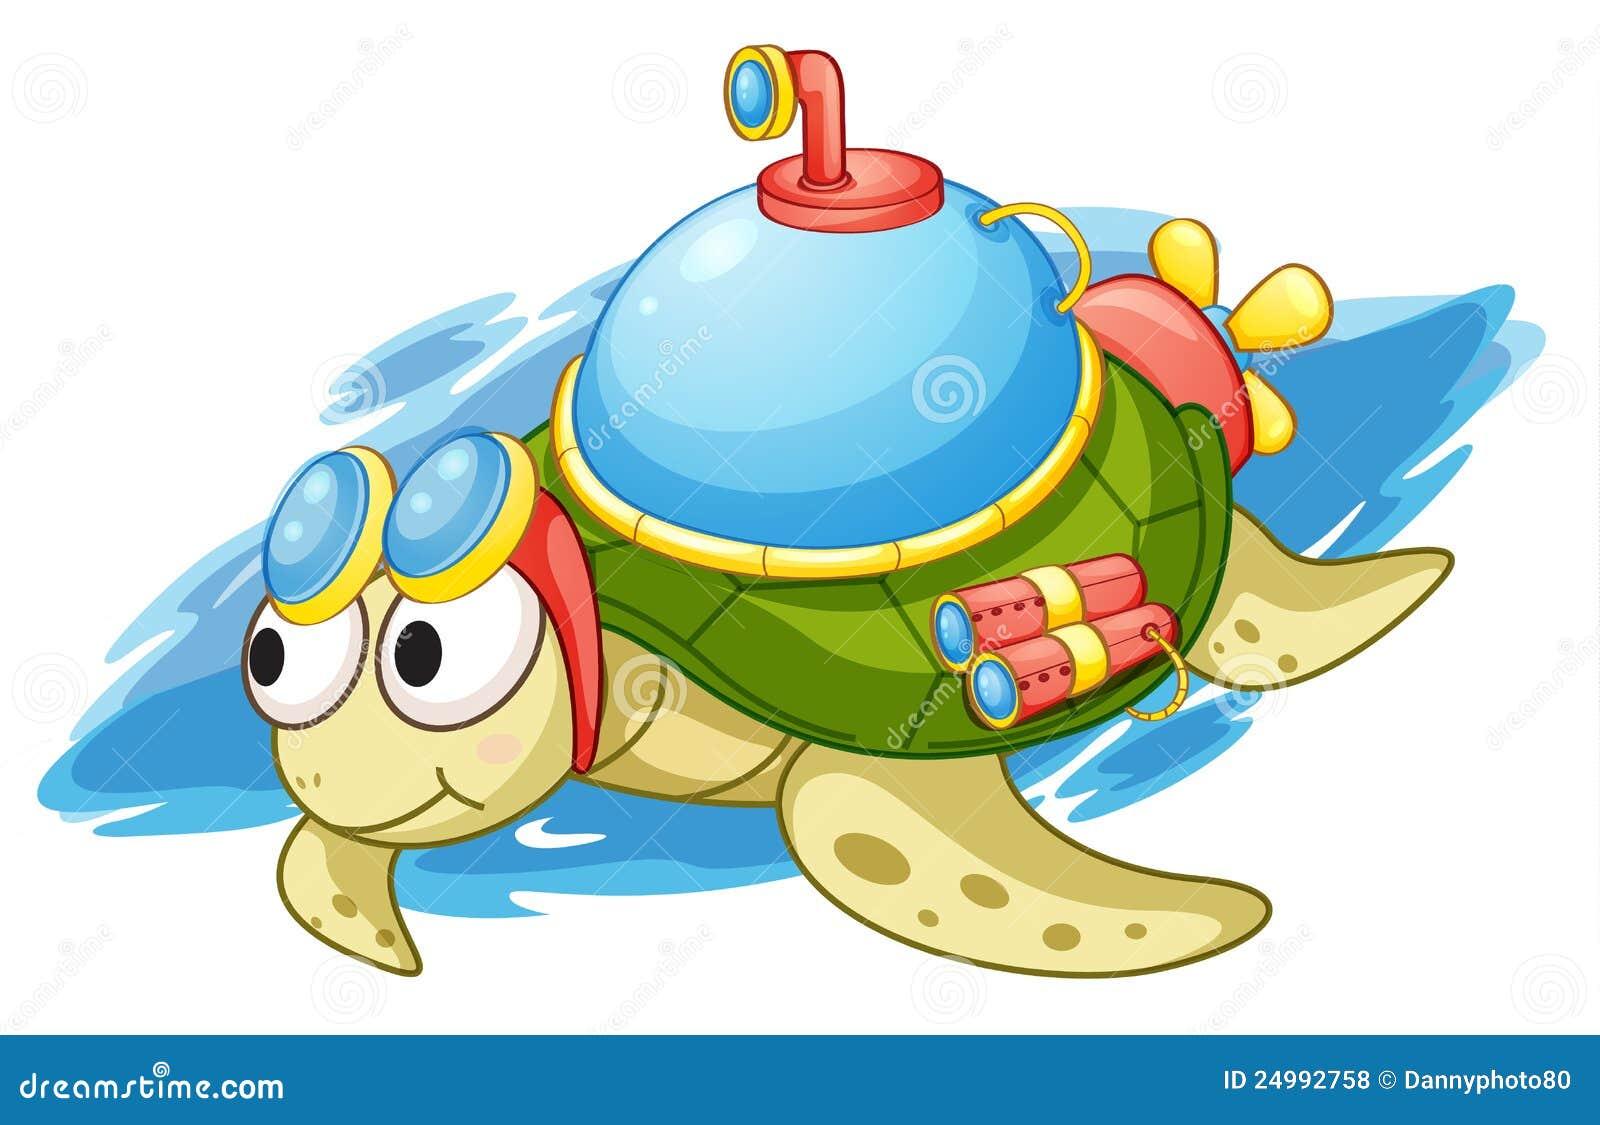 turbo turtle stock illustration illustration of comical 24992758